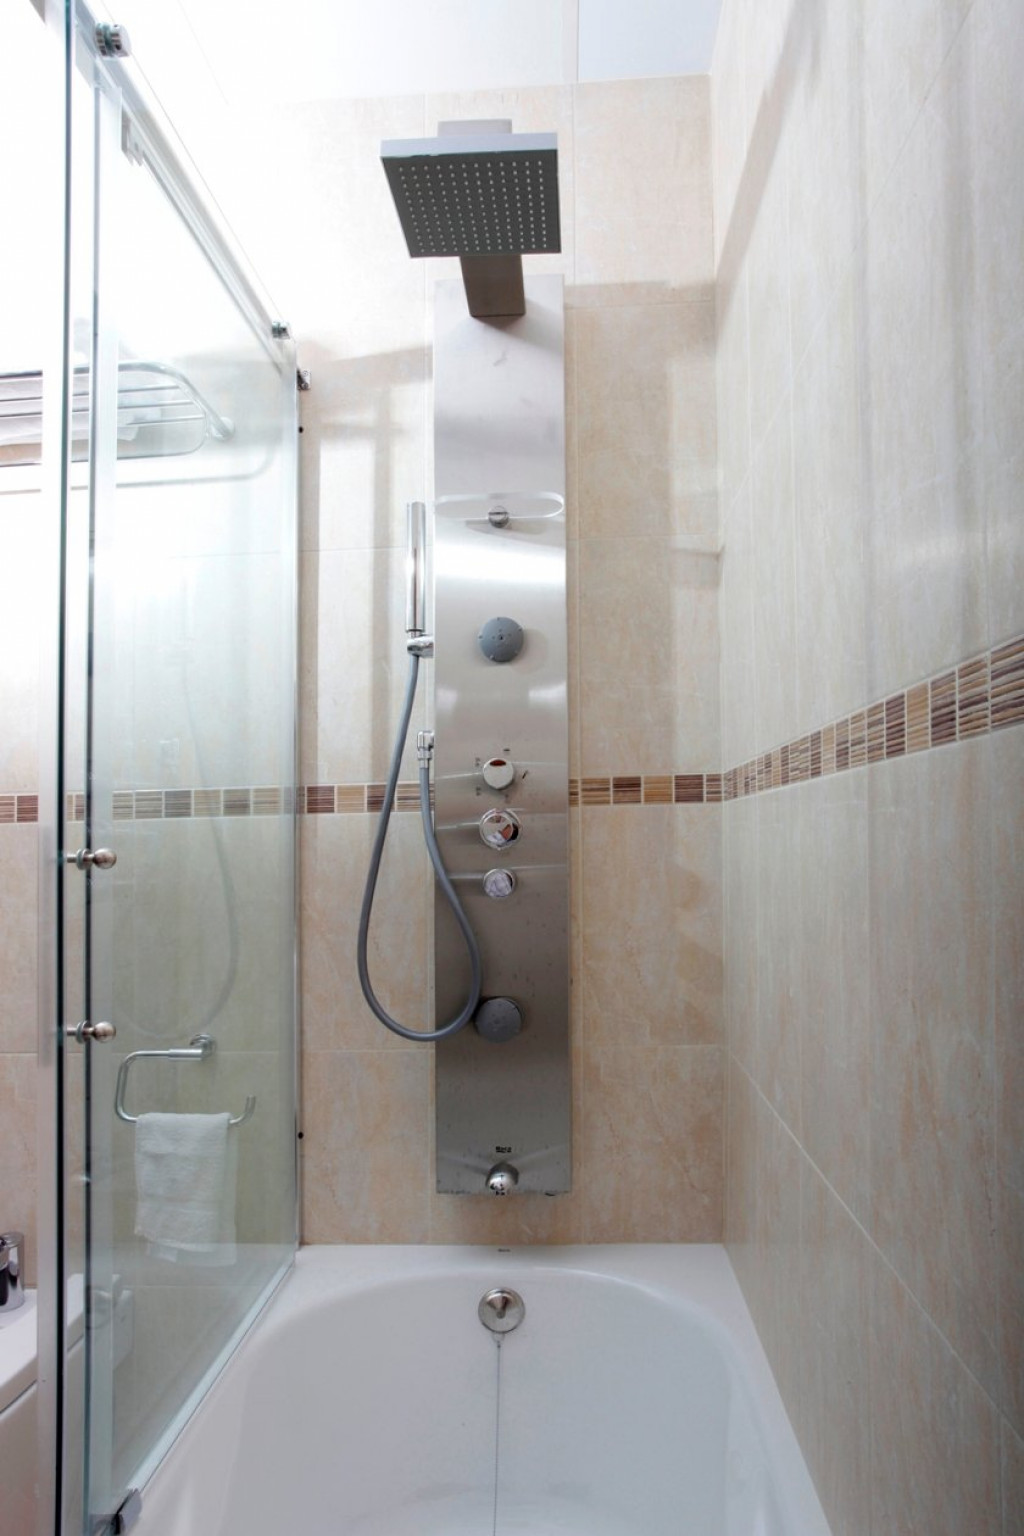 Randa Bolig - Mallorca - 1bano-habitacion2_1_e9e6af2a60069ca37a84a6115bfdad7c